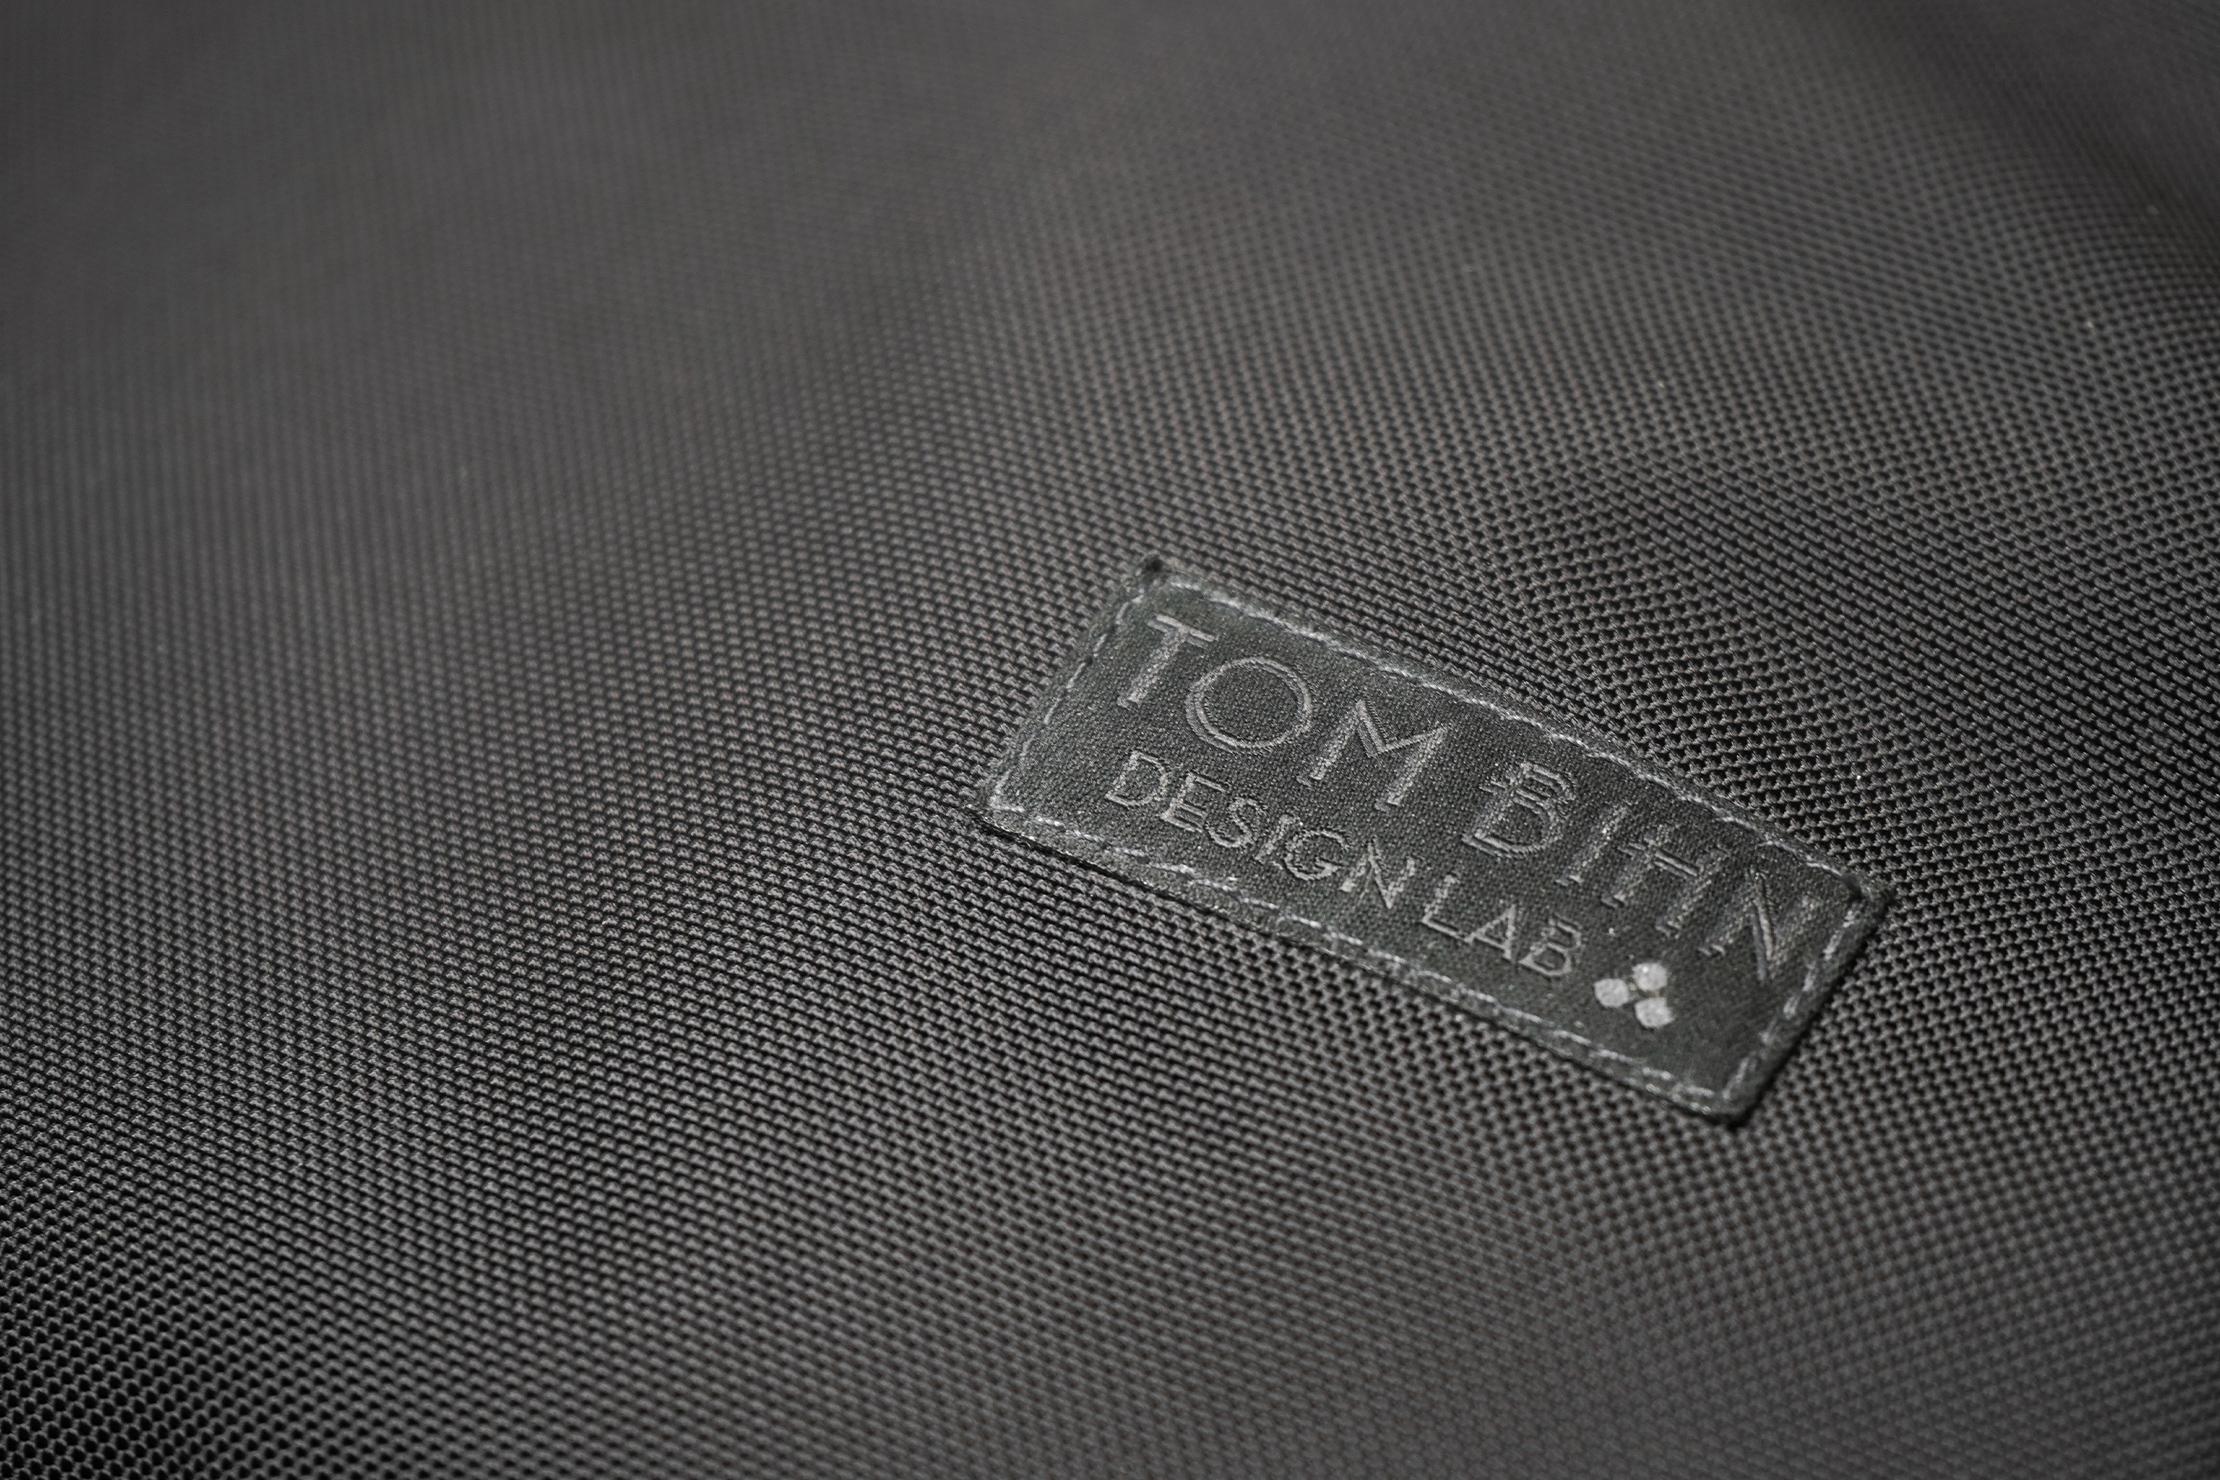 Tom Bihn Paragon Backpack | Design Lab logo & material